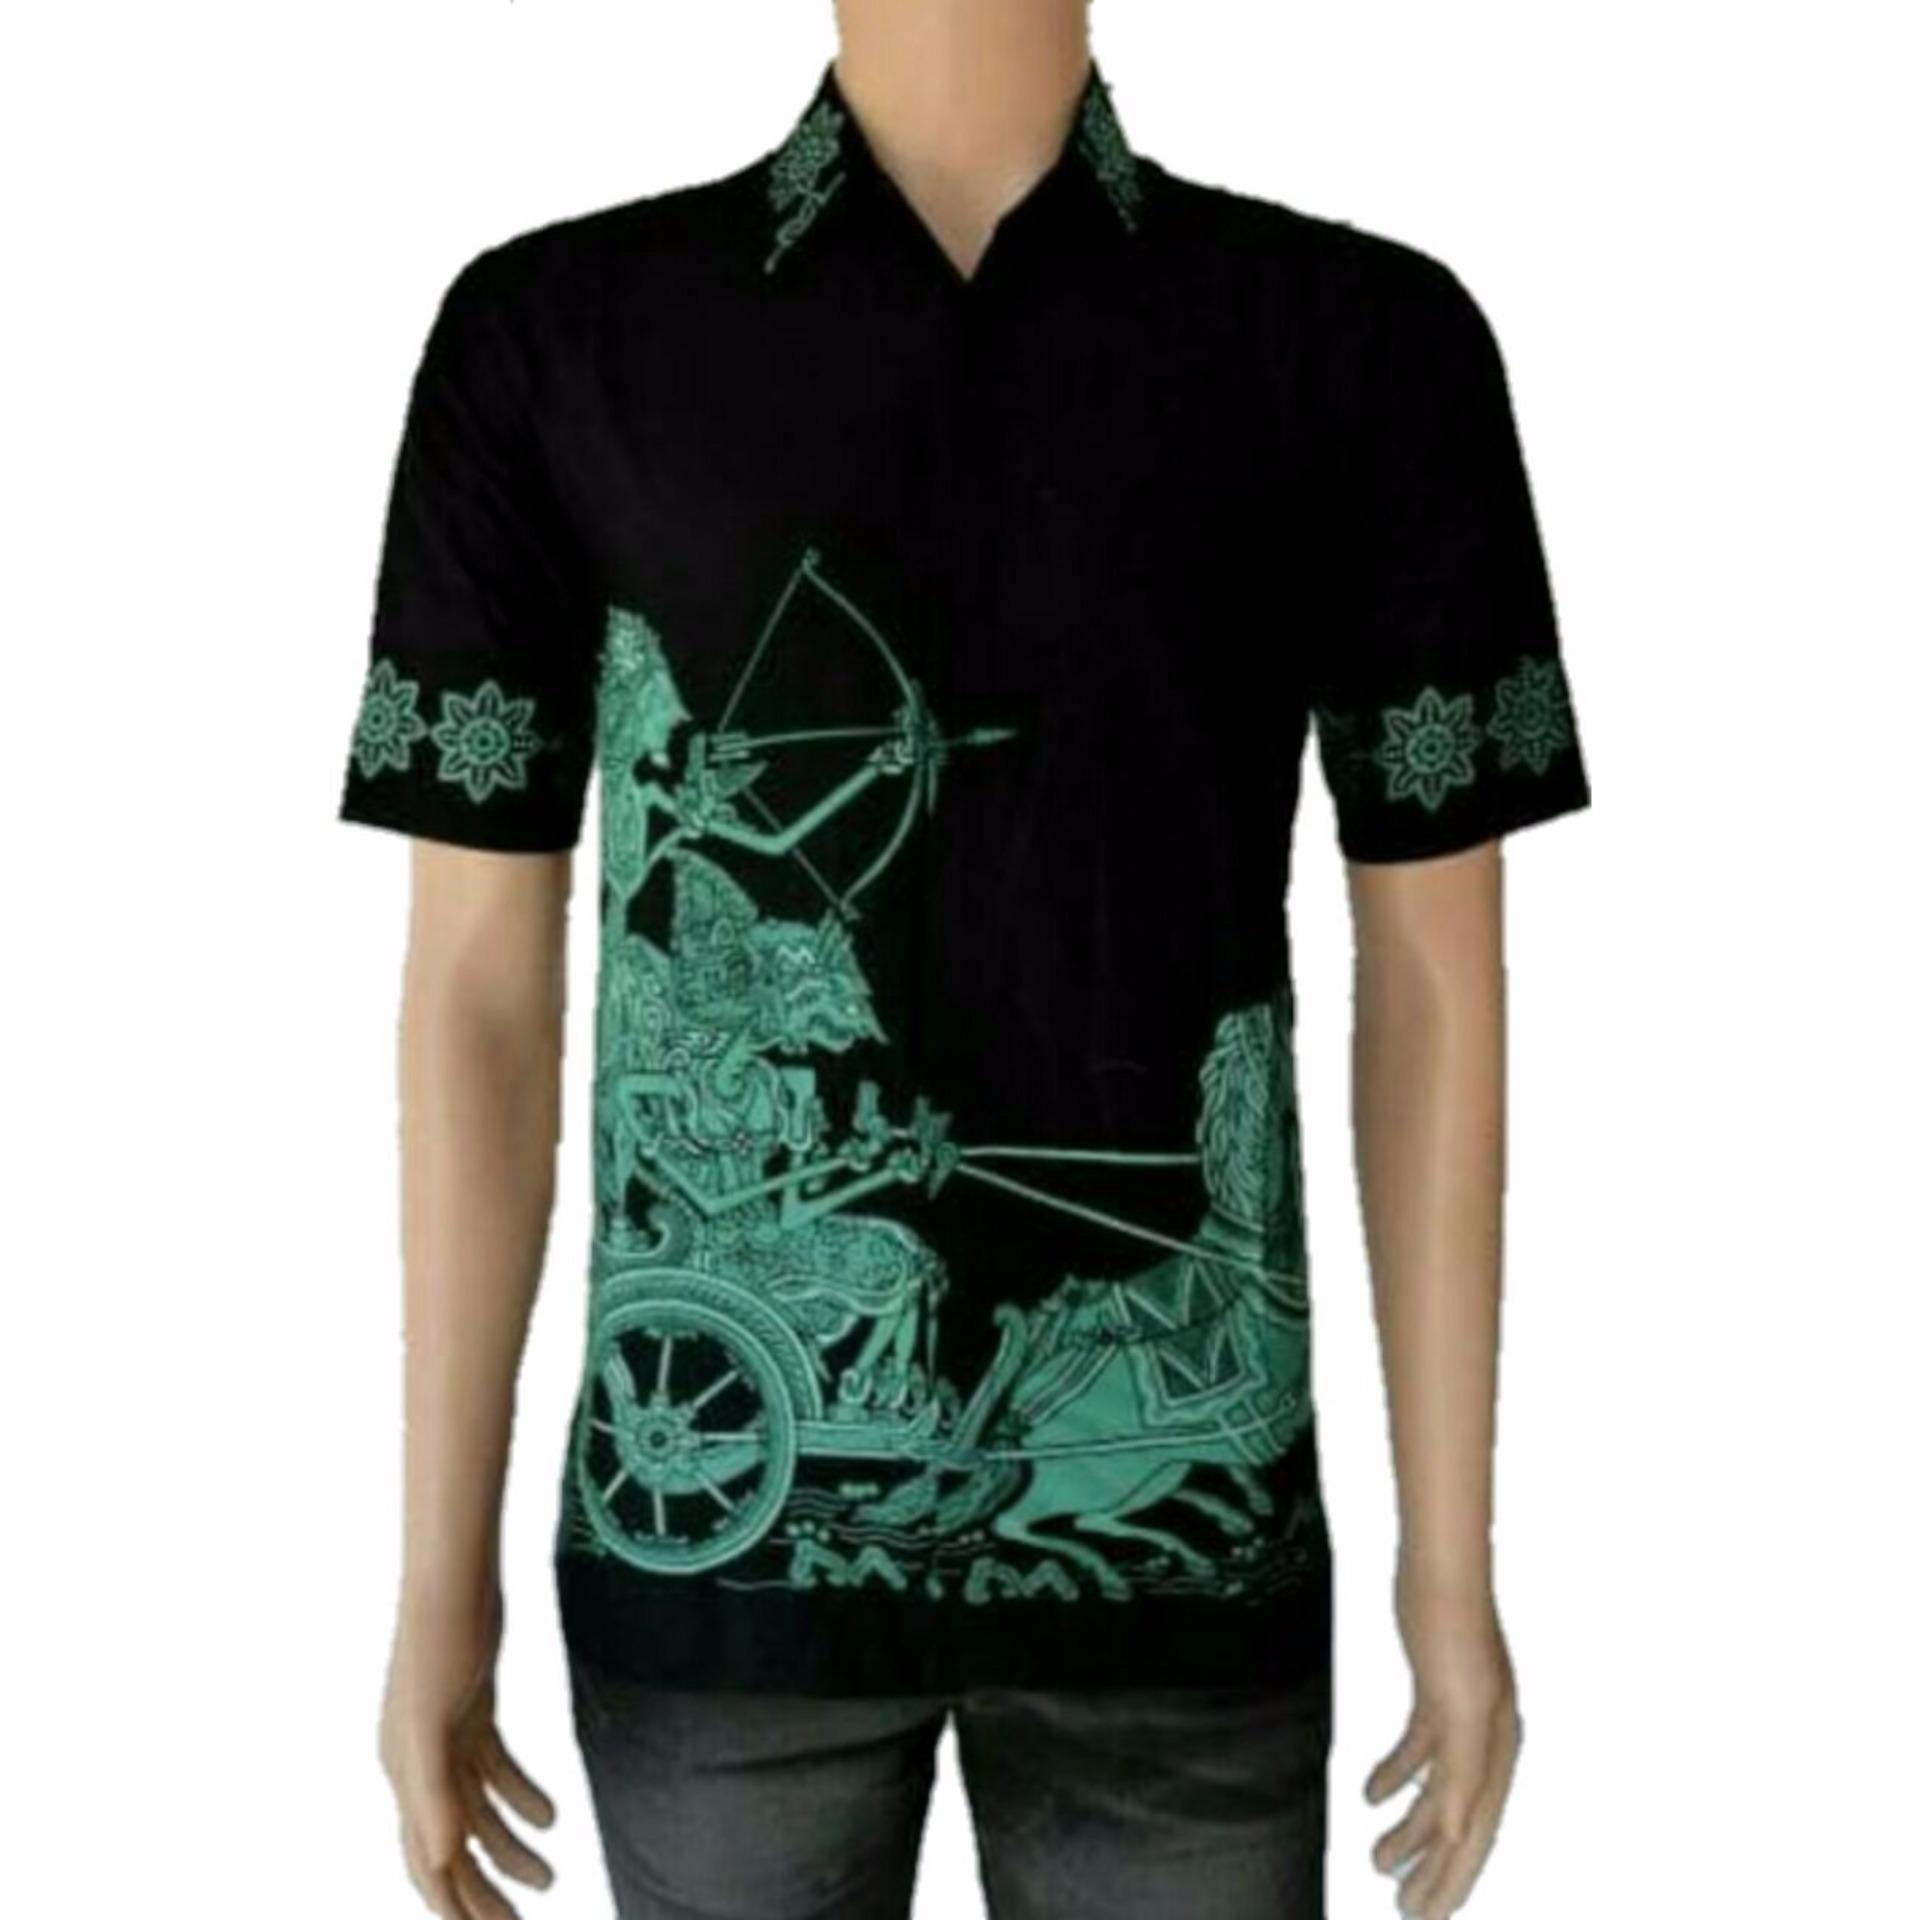 Model Kemeja Batik Pria Kemeja Batik Pekalongan Kemeja Batik Modern Motif Arjuna Hijau